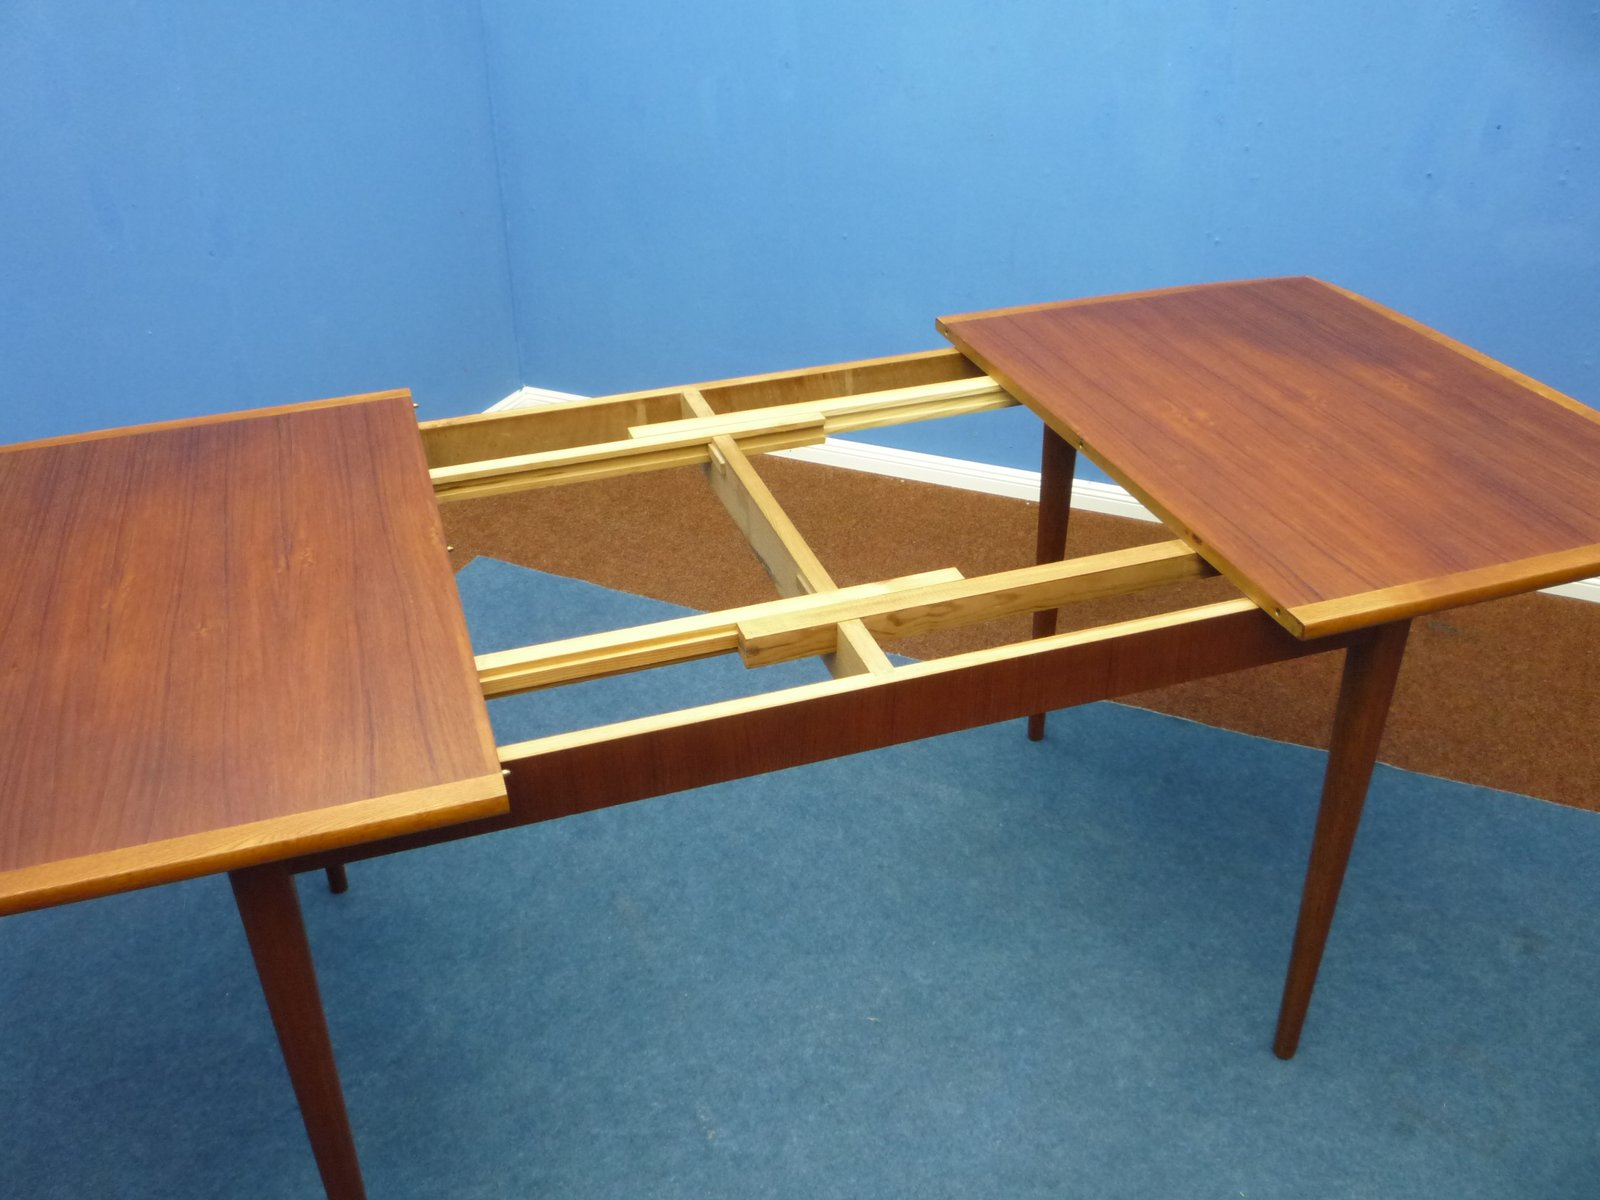 Table de salle manger mid century en teck 1960s en - Table salle a manger teck ...